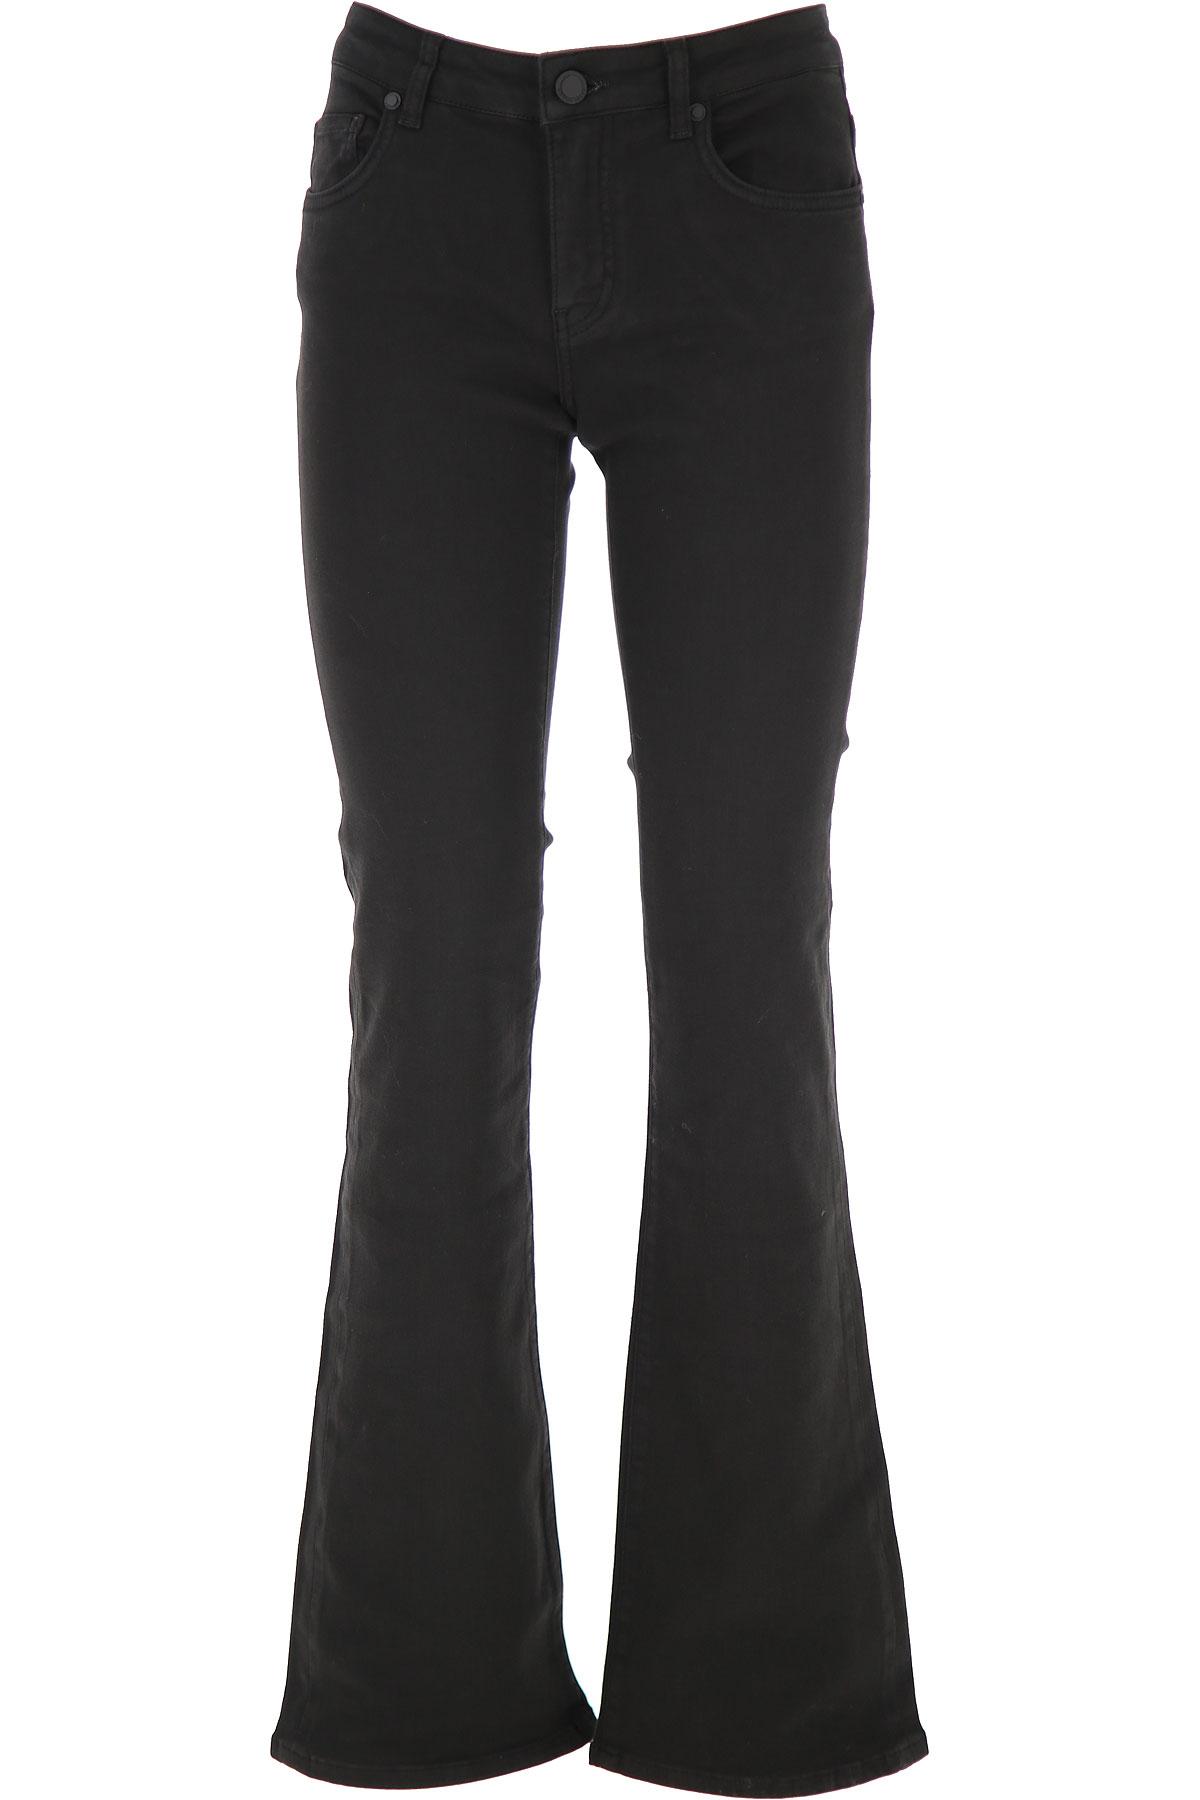 Silvian Heach Jeans On Sale, Black, Cotton, 2019, 25 26 27 28 29 30